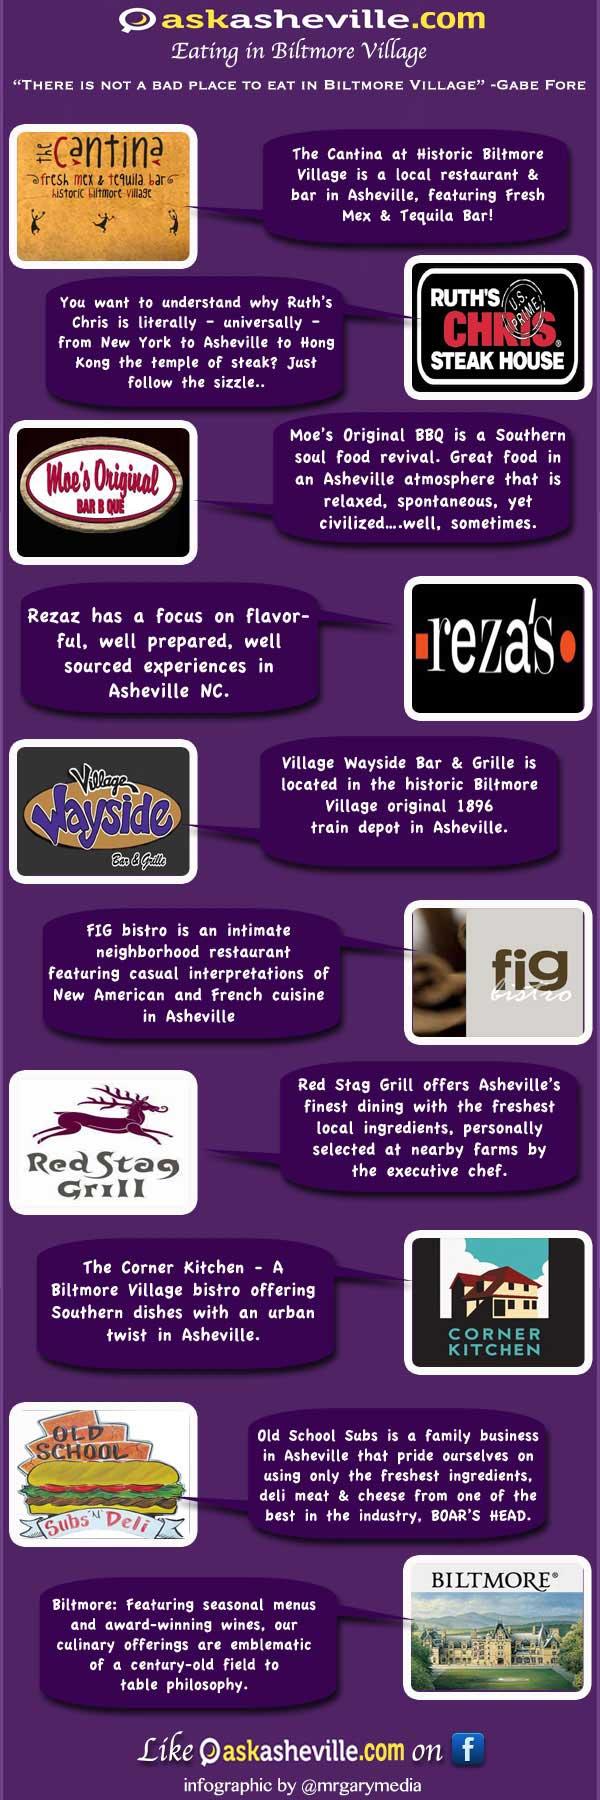 10 Asheville Restaurants & Eateries in Biltmore Village